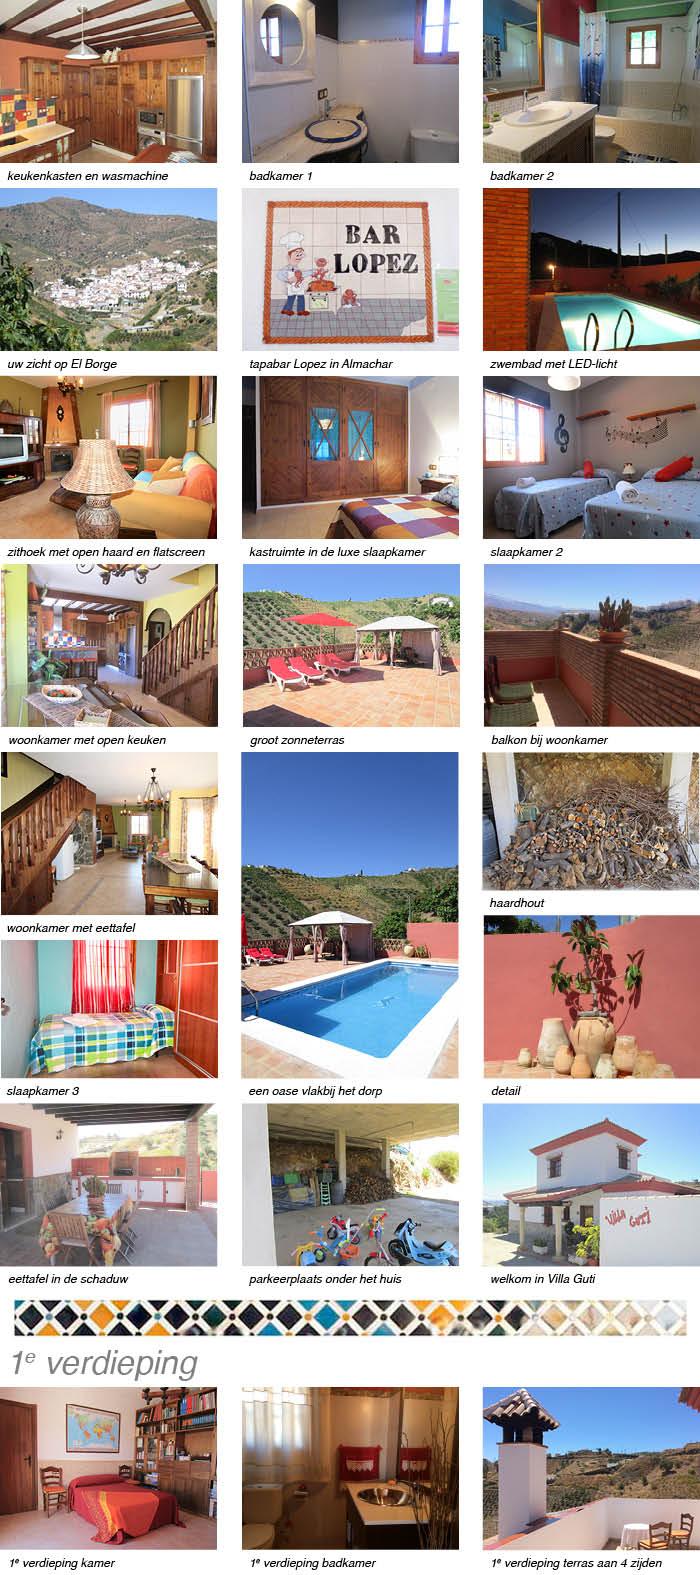 Casa Villa Guti interieur fotos onder